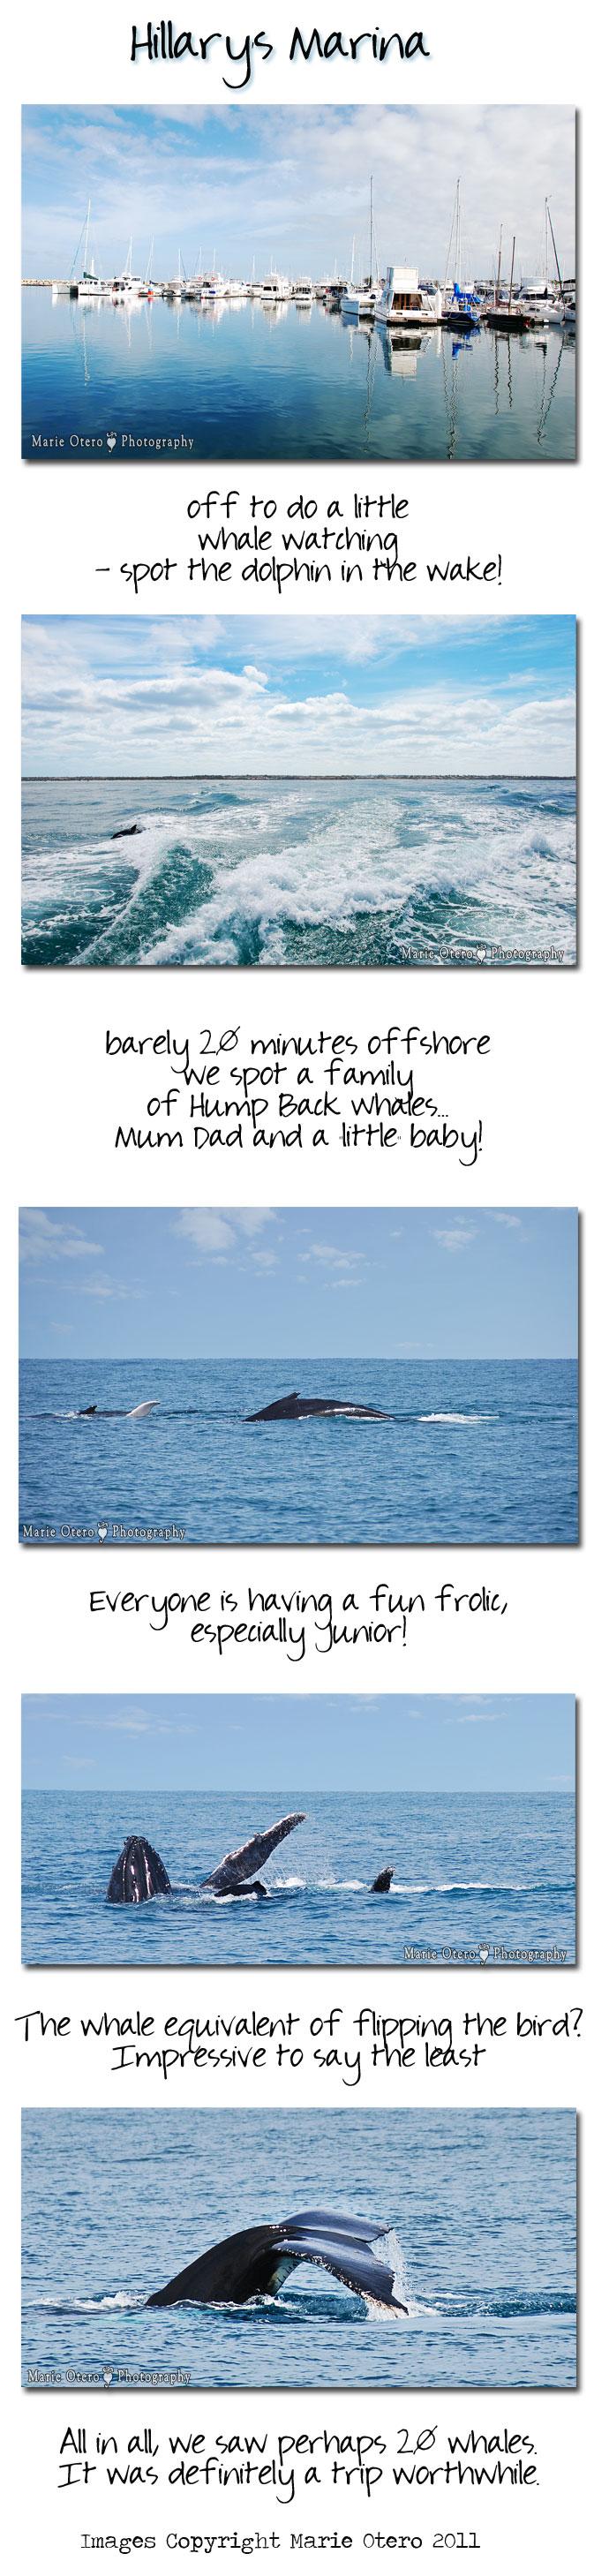 Tp_whales10nov2011